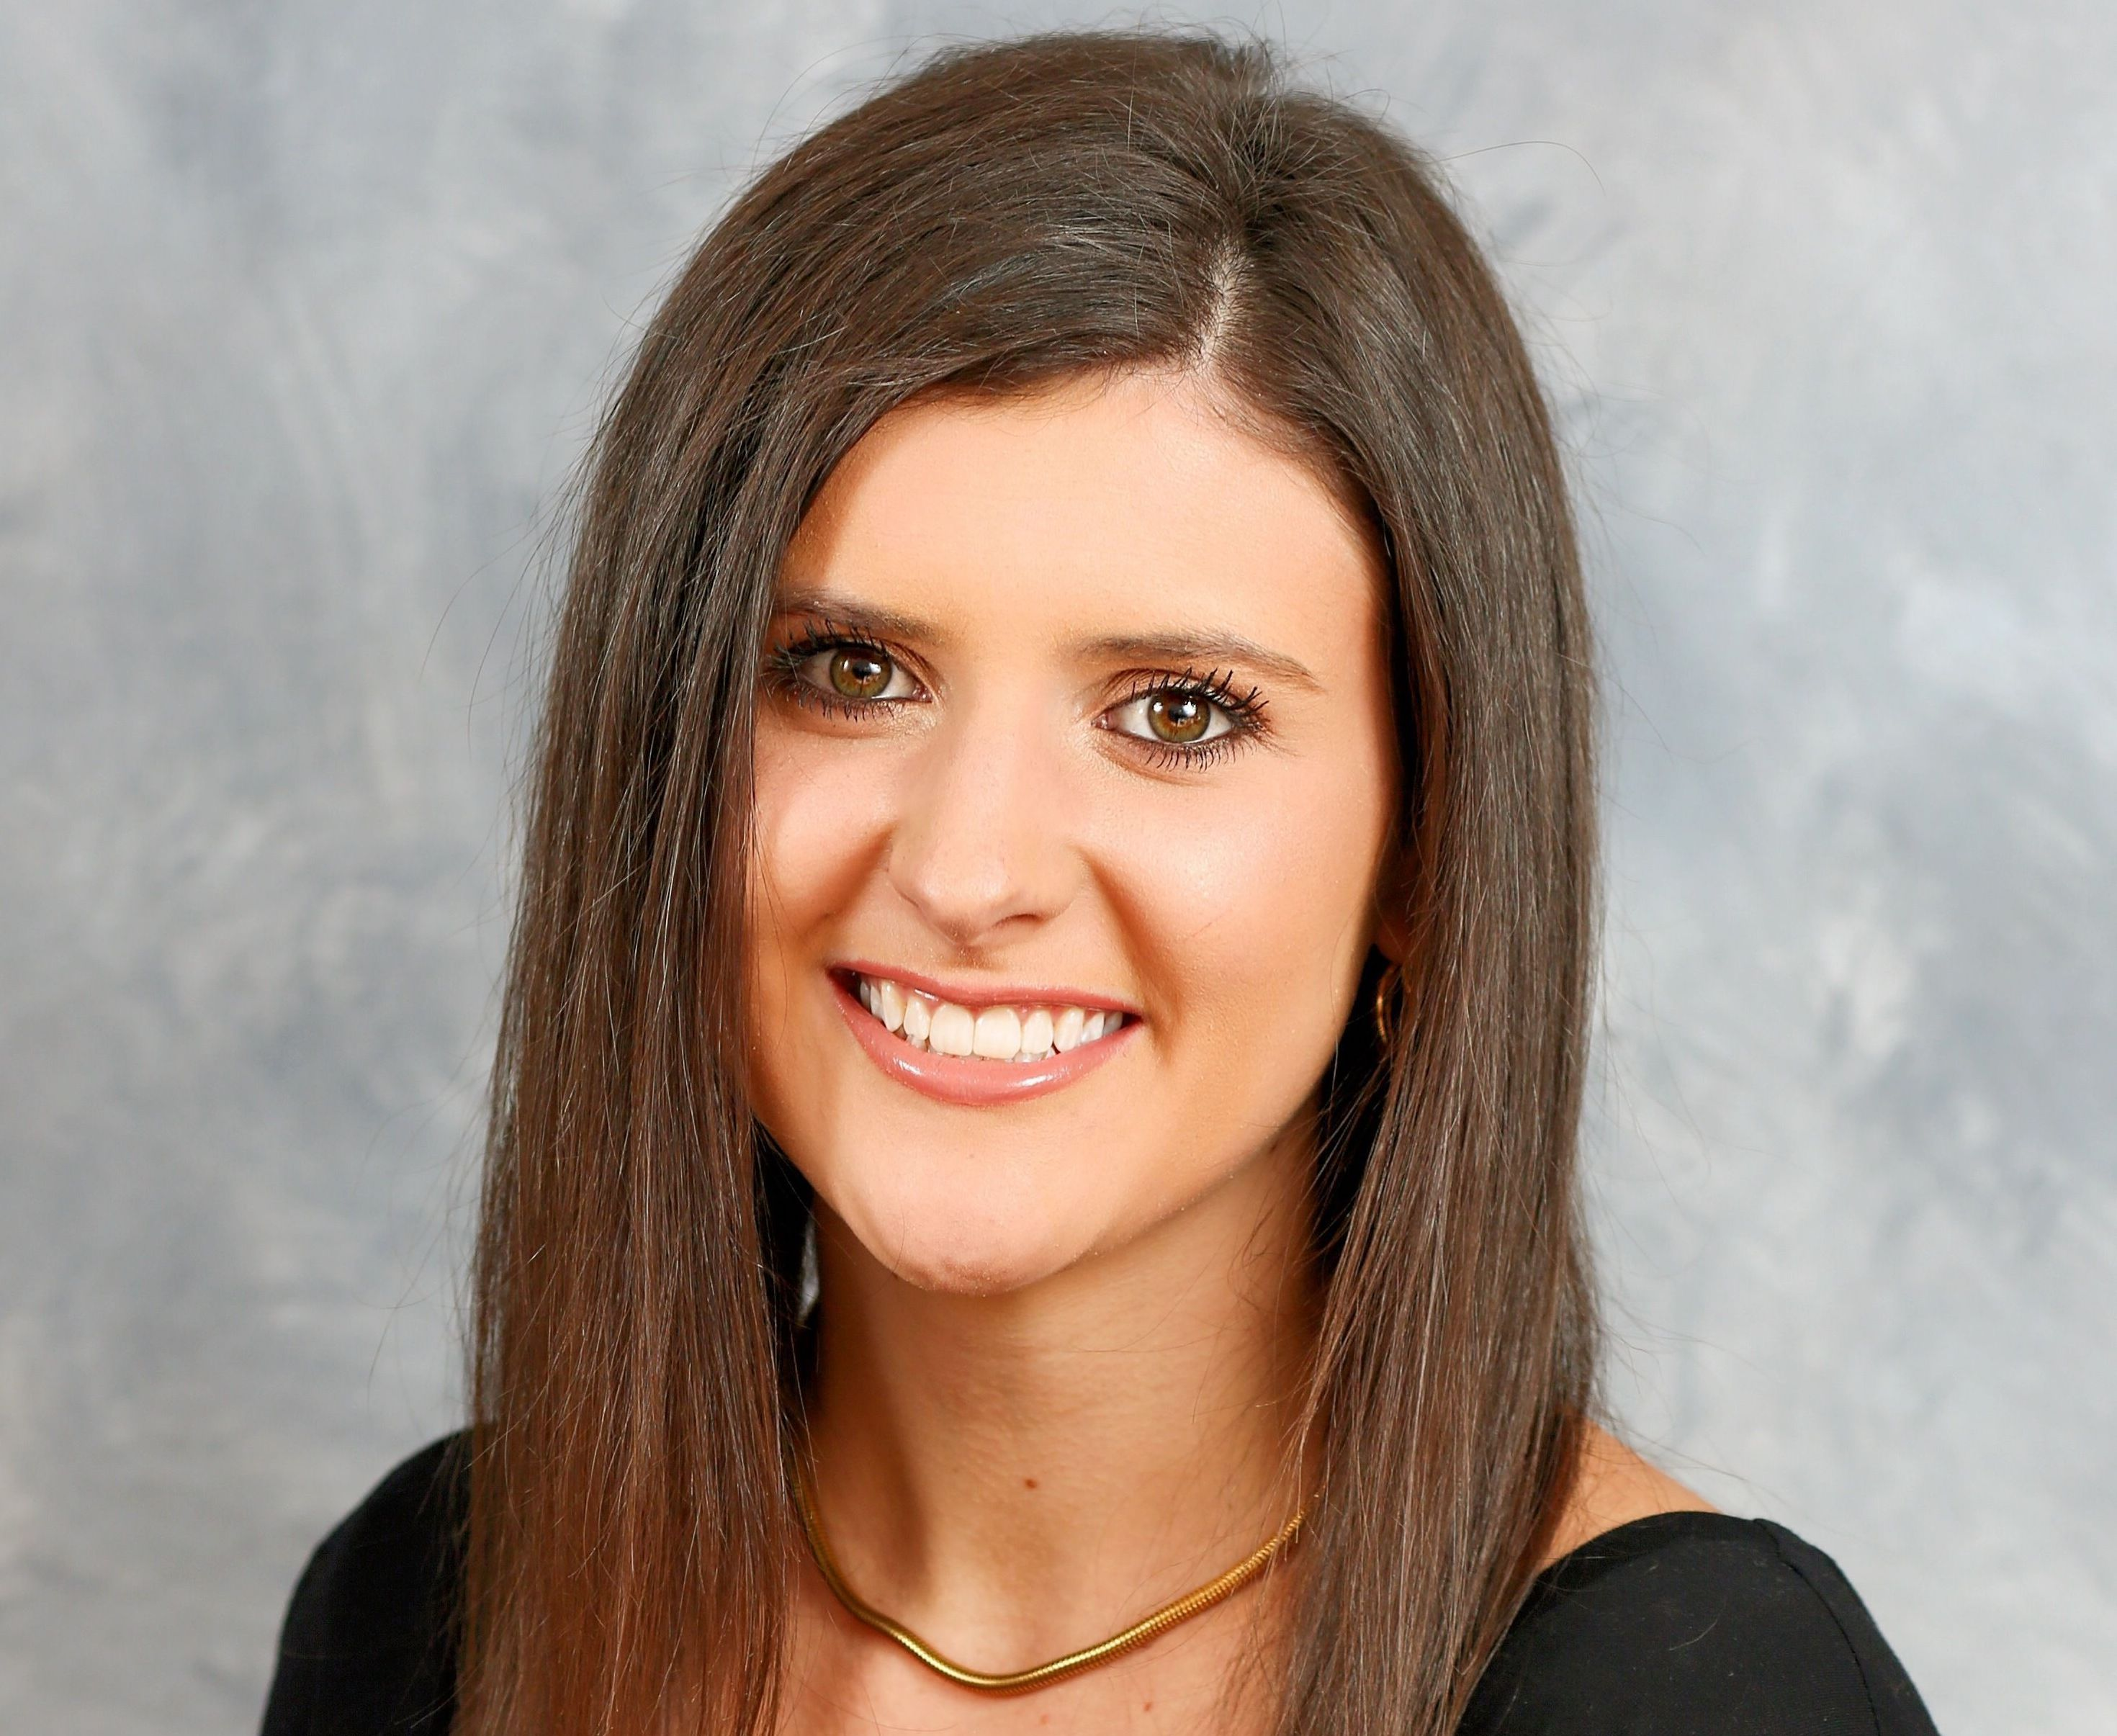 Ellie Kavanaugh